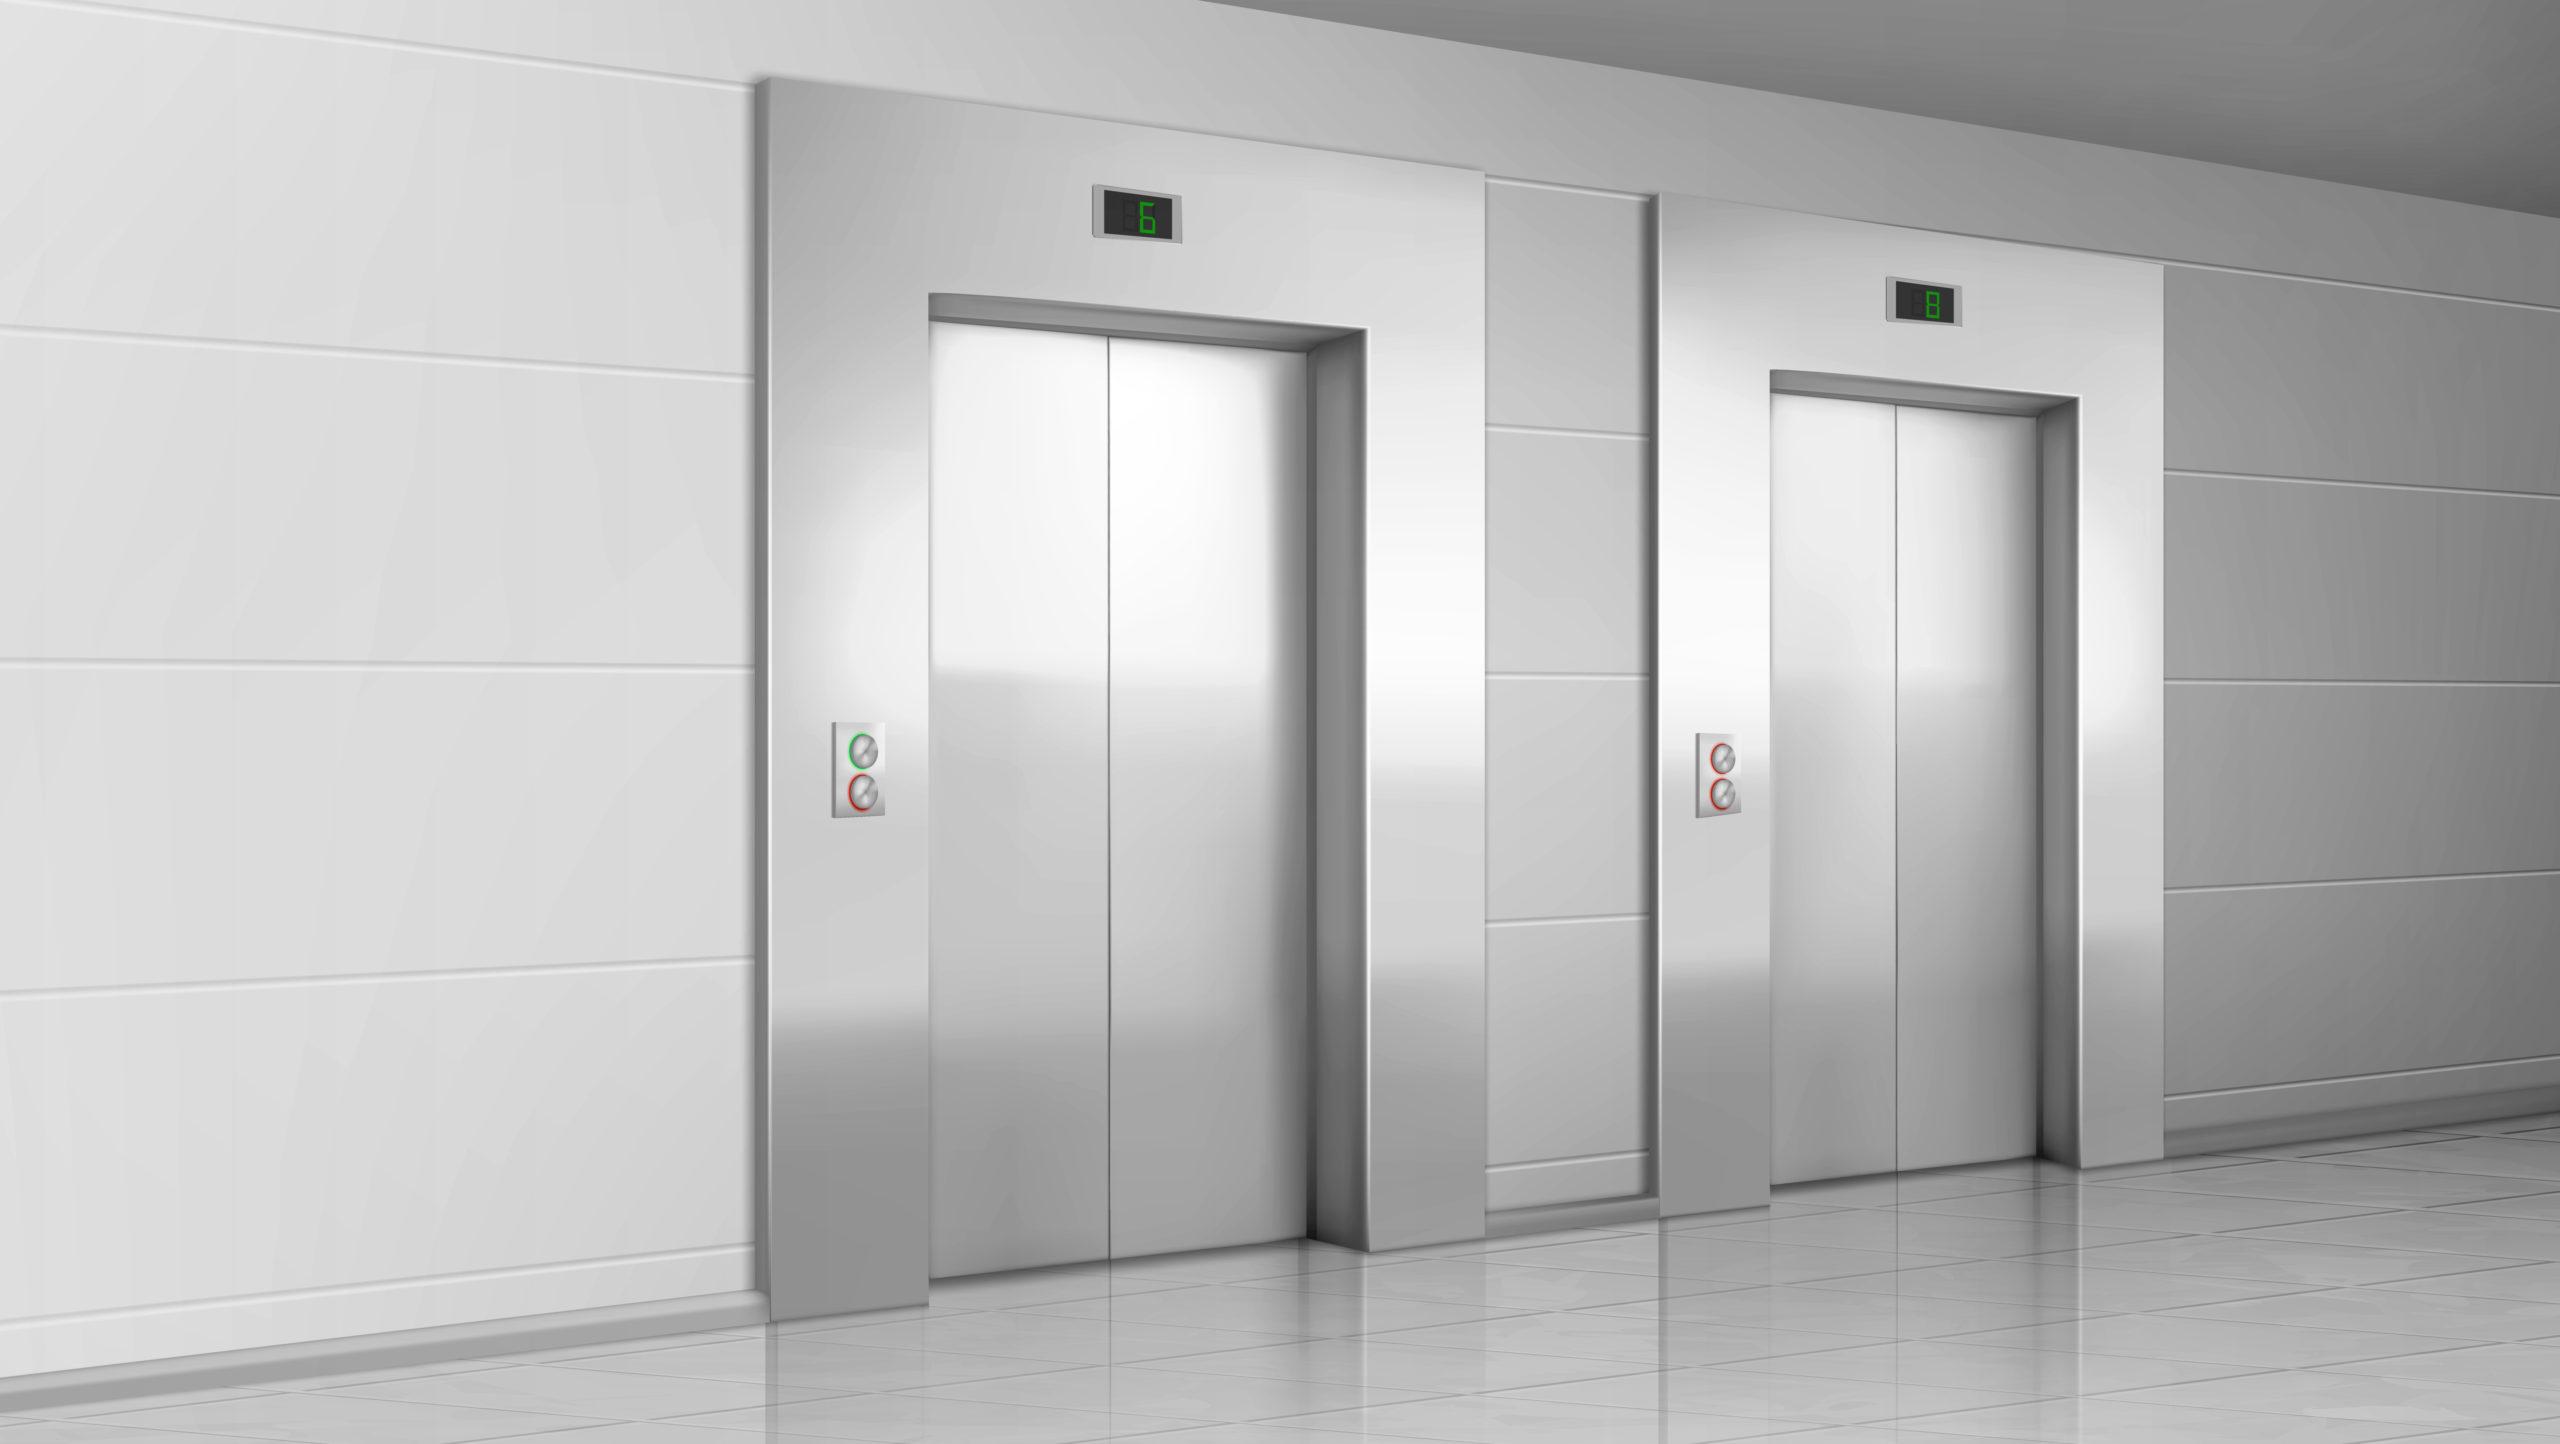 Inoxmur -Lift´s doors & keypads